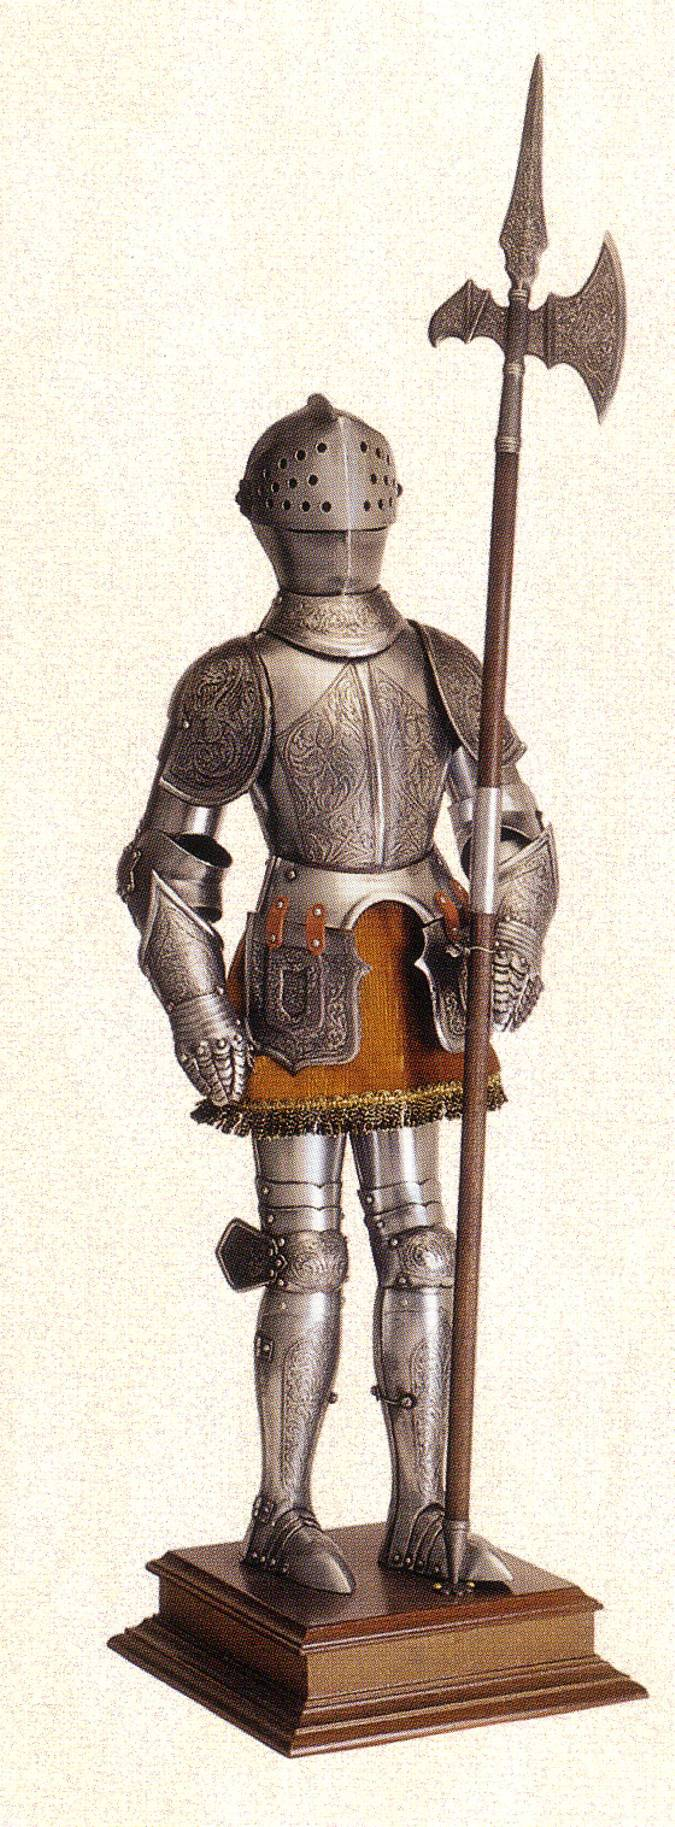 Armadura medieval en miniatura